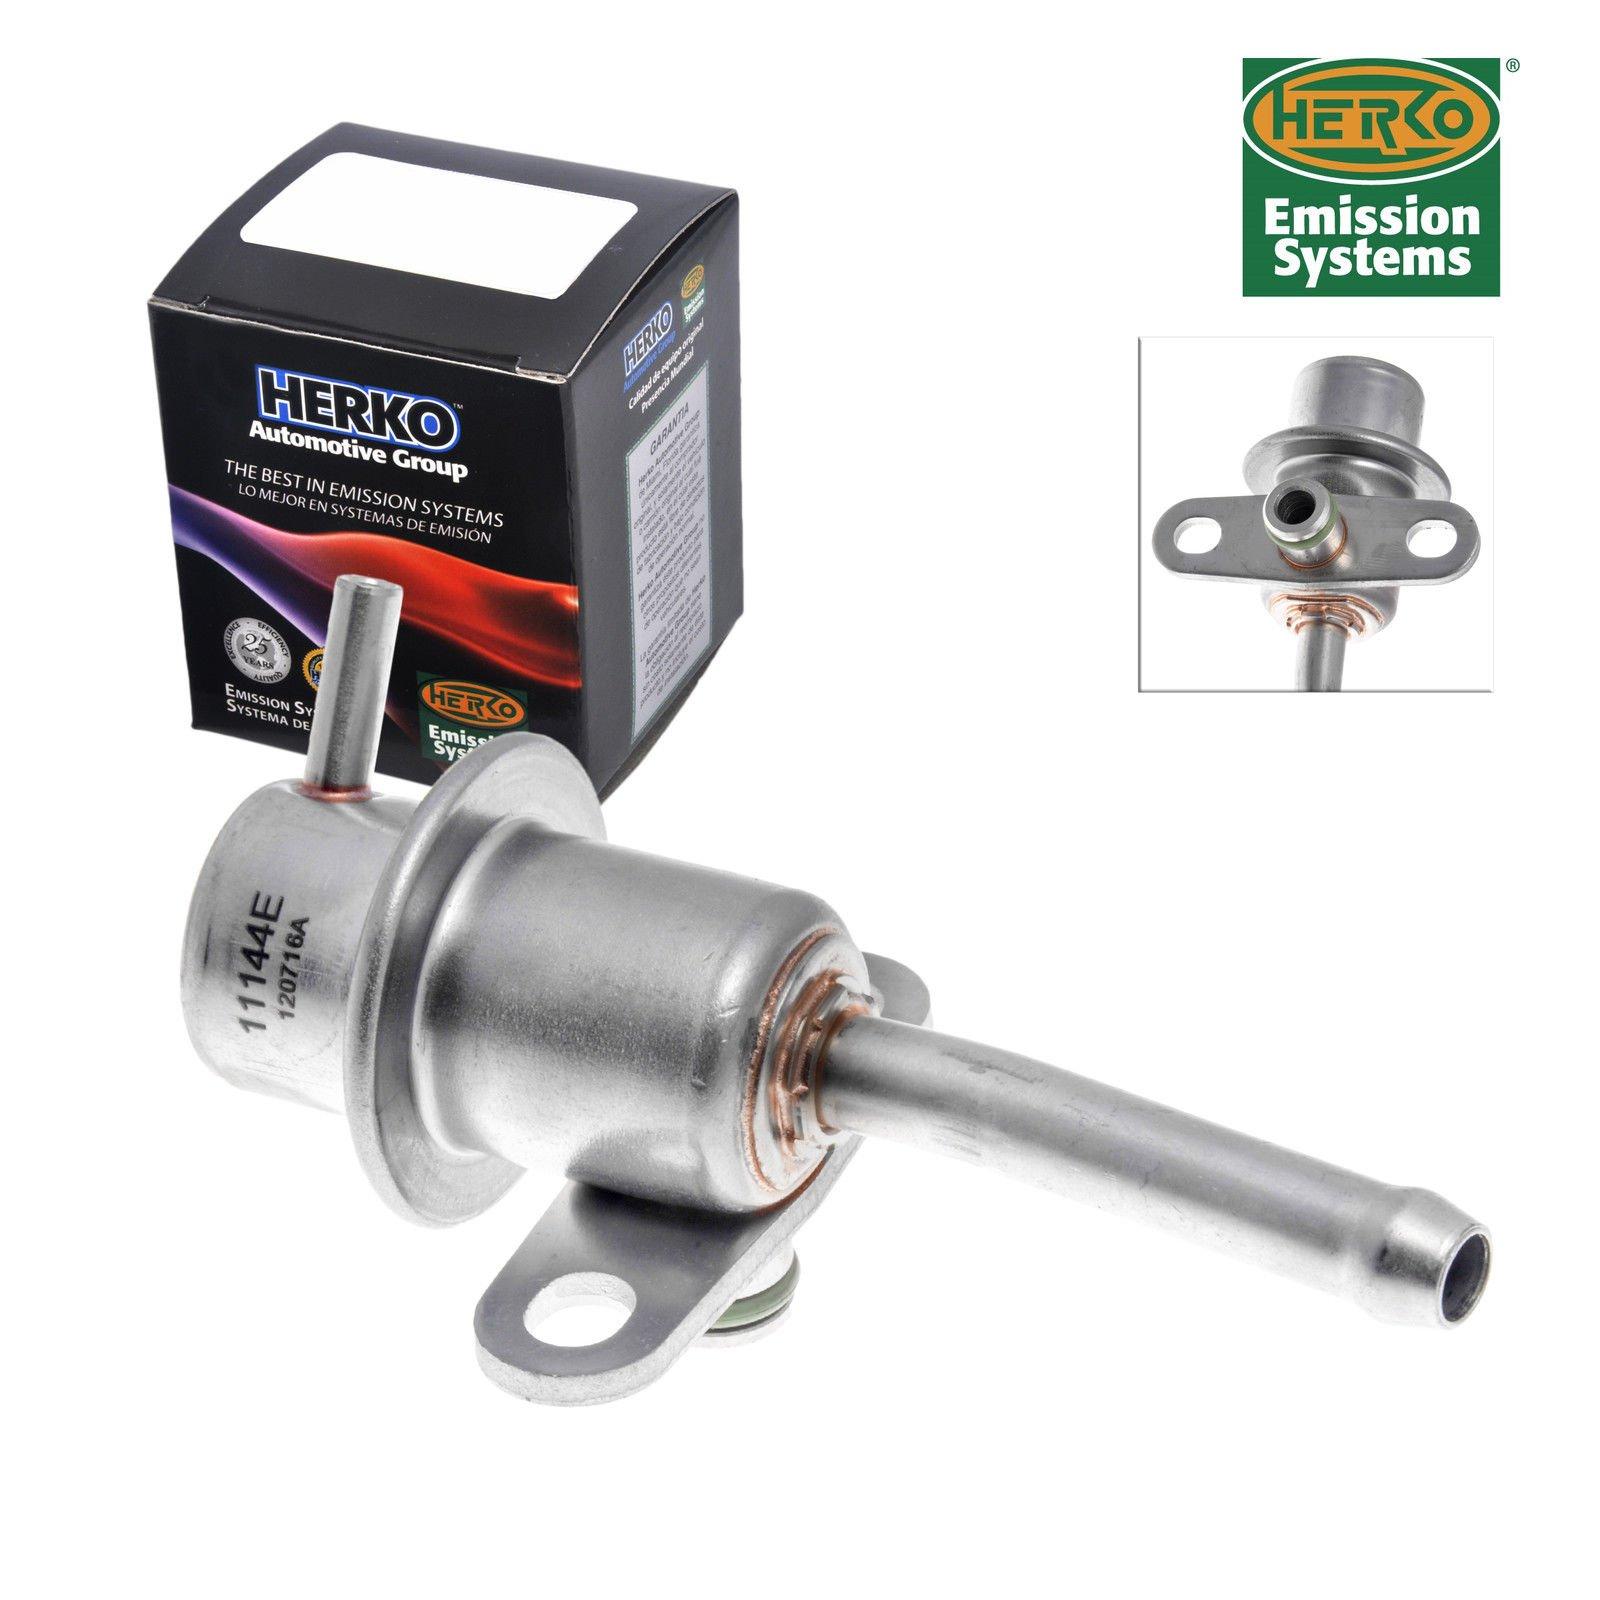 AD Auto Parts New Herko Fuel Pressure Regulator PR4113 for Toyota Lexus 1998-2009